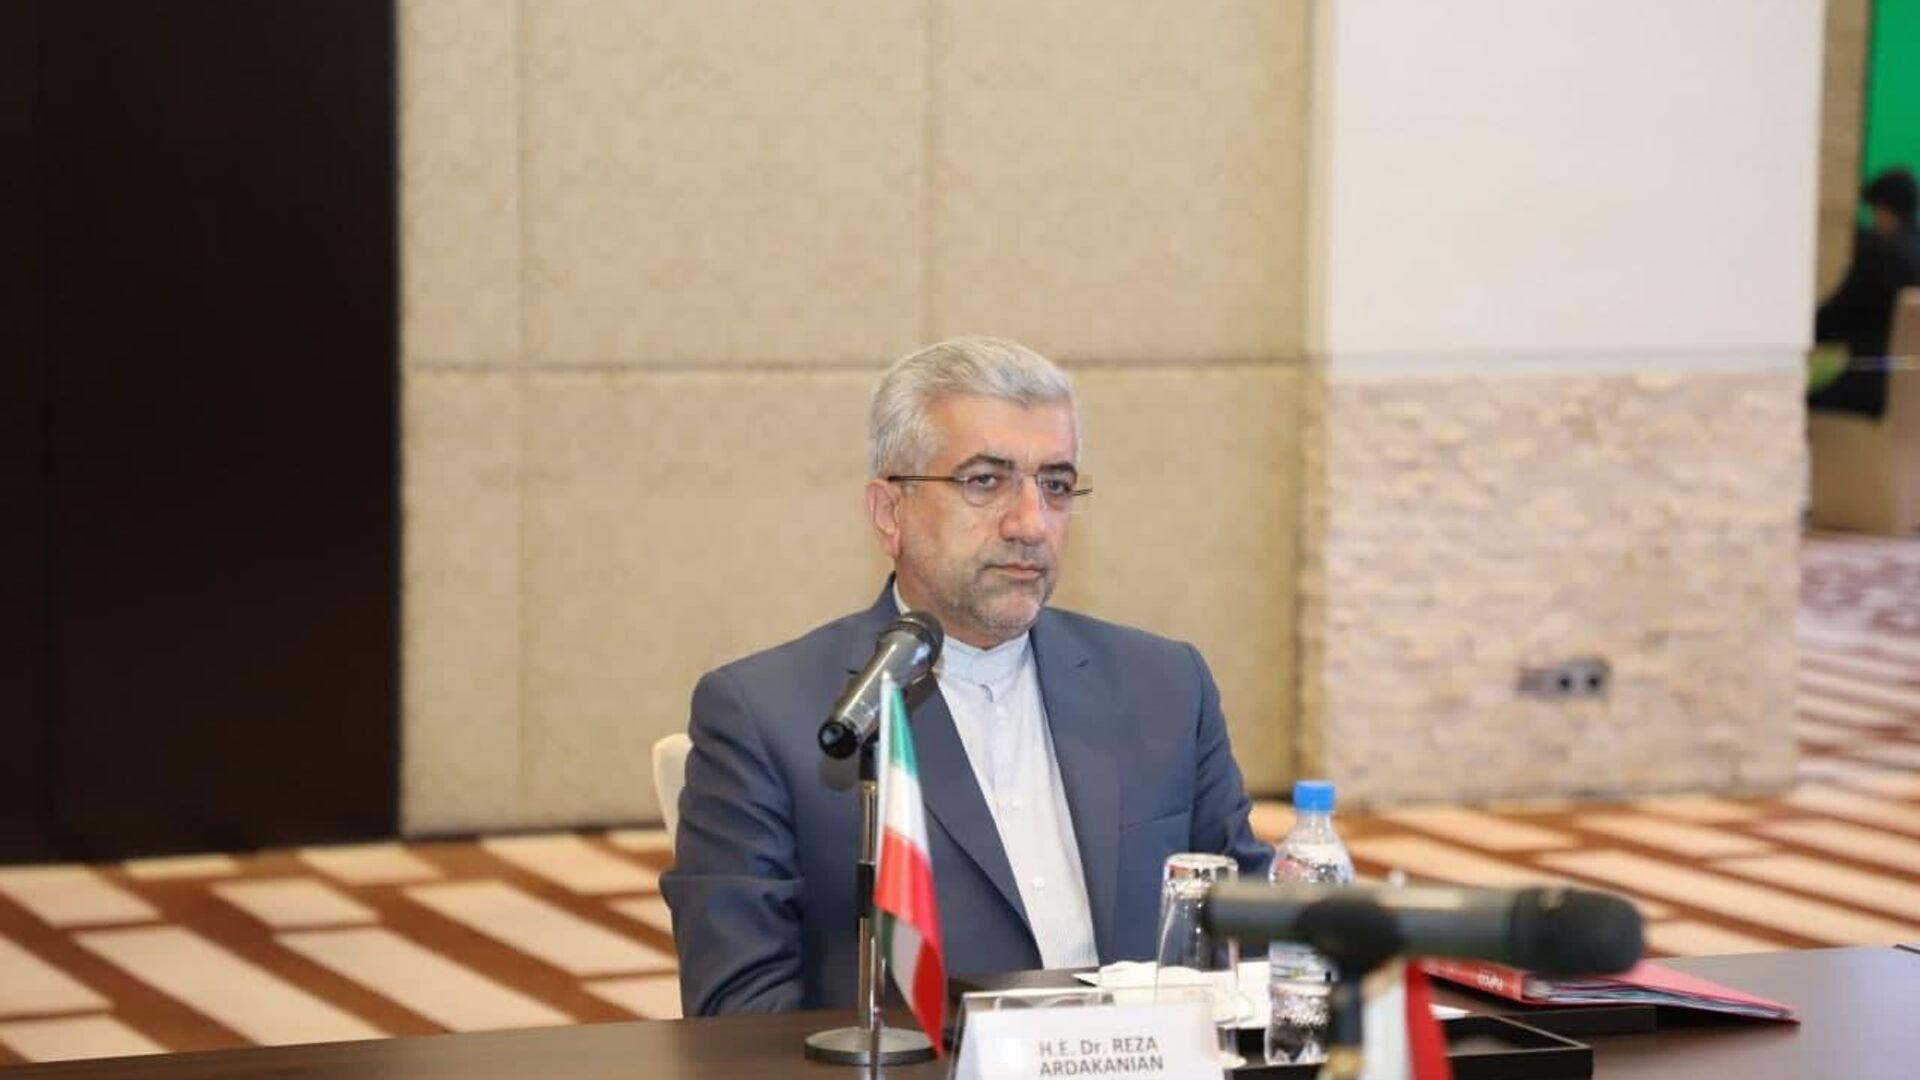 Министр энергетики Ирана  Реза Ардеканиан - Sputnik Таджикистан, 1920, 07.06.2021